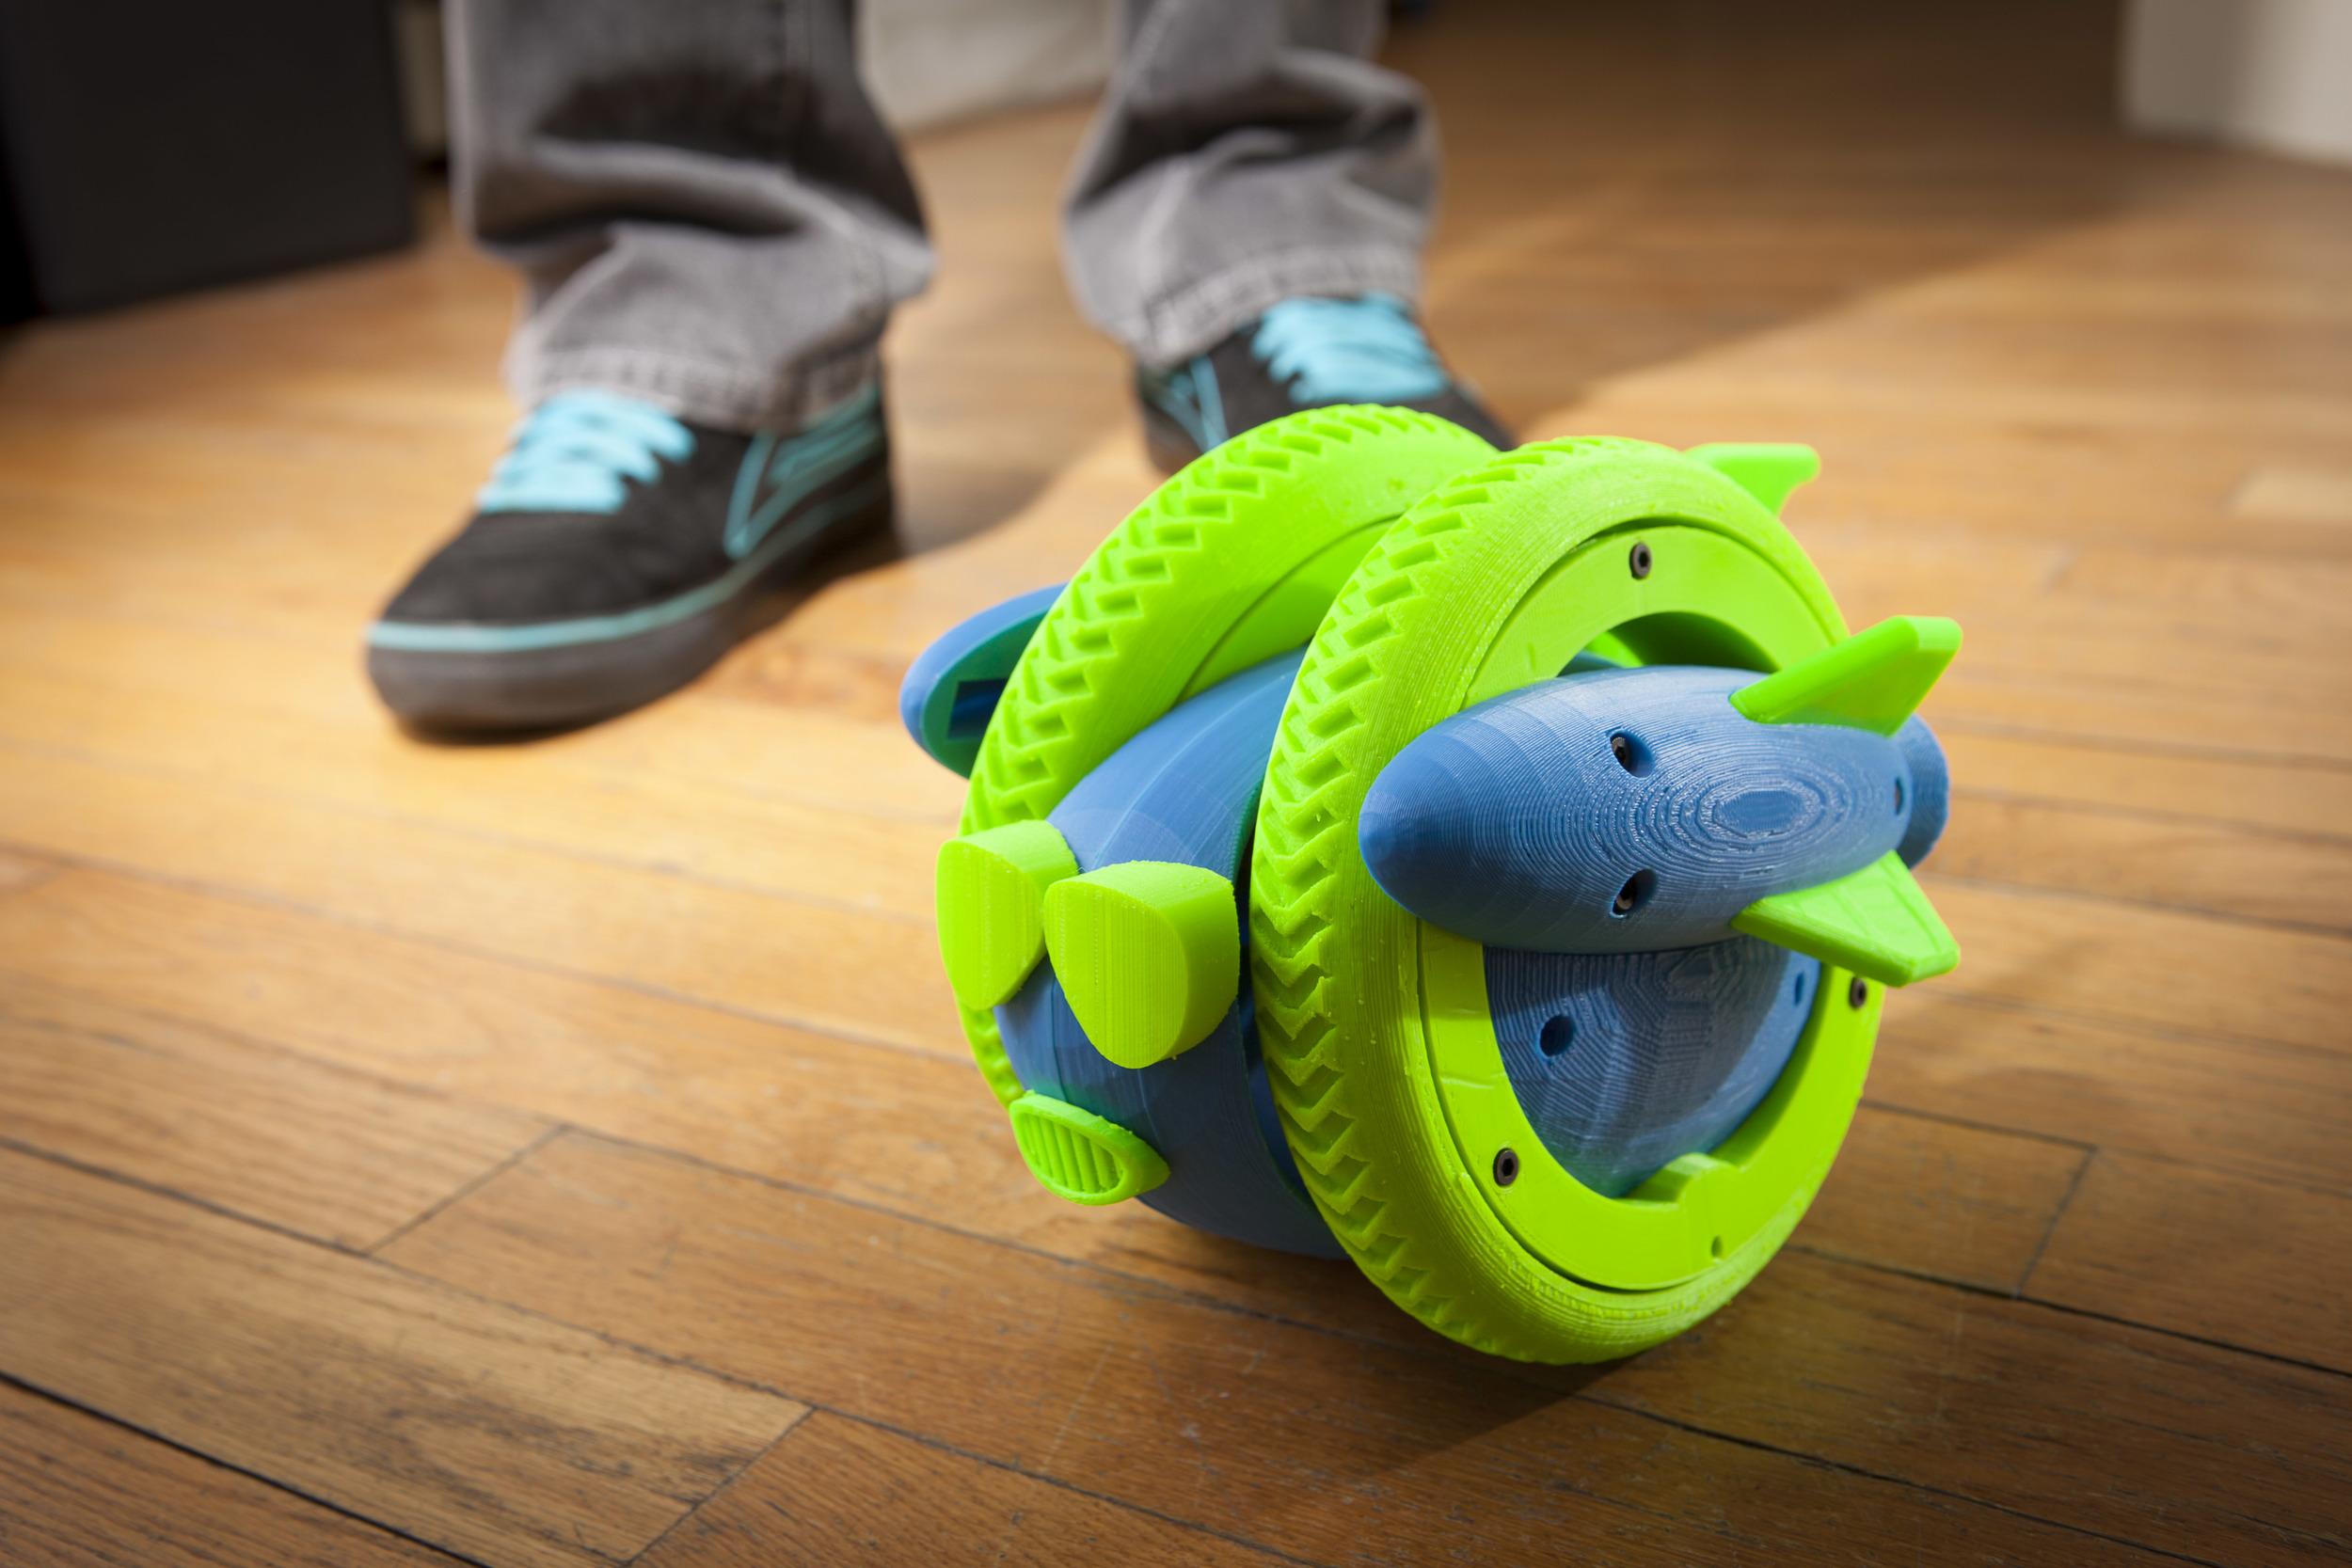 Wheely the robotic chicken.jpg